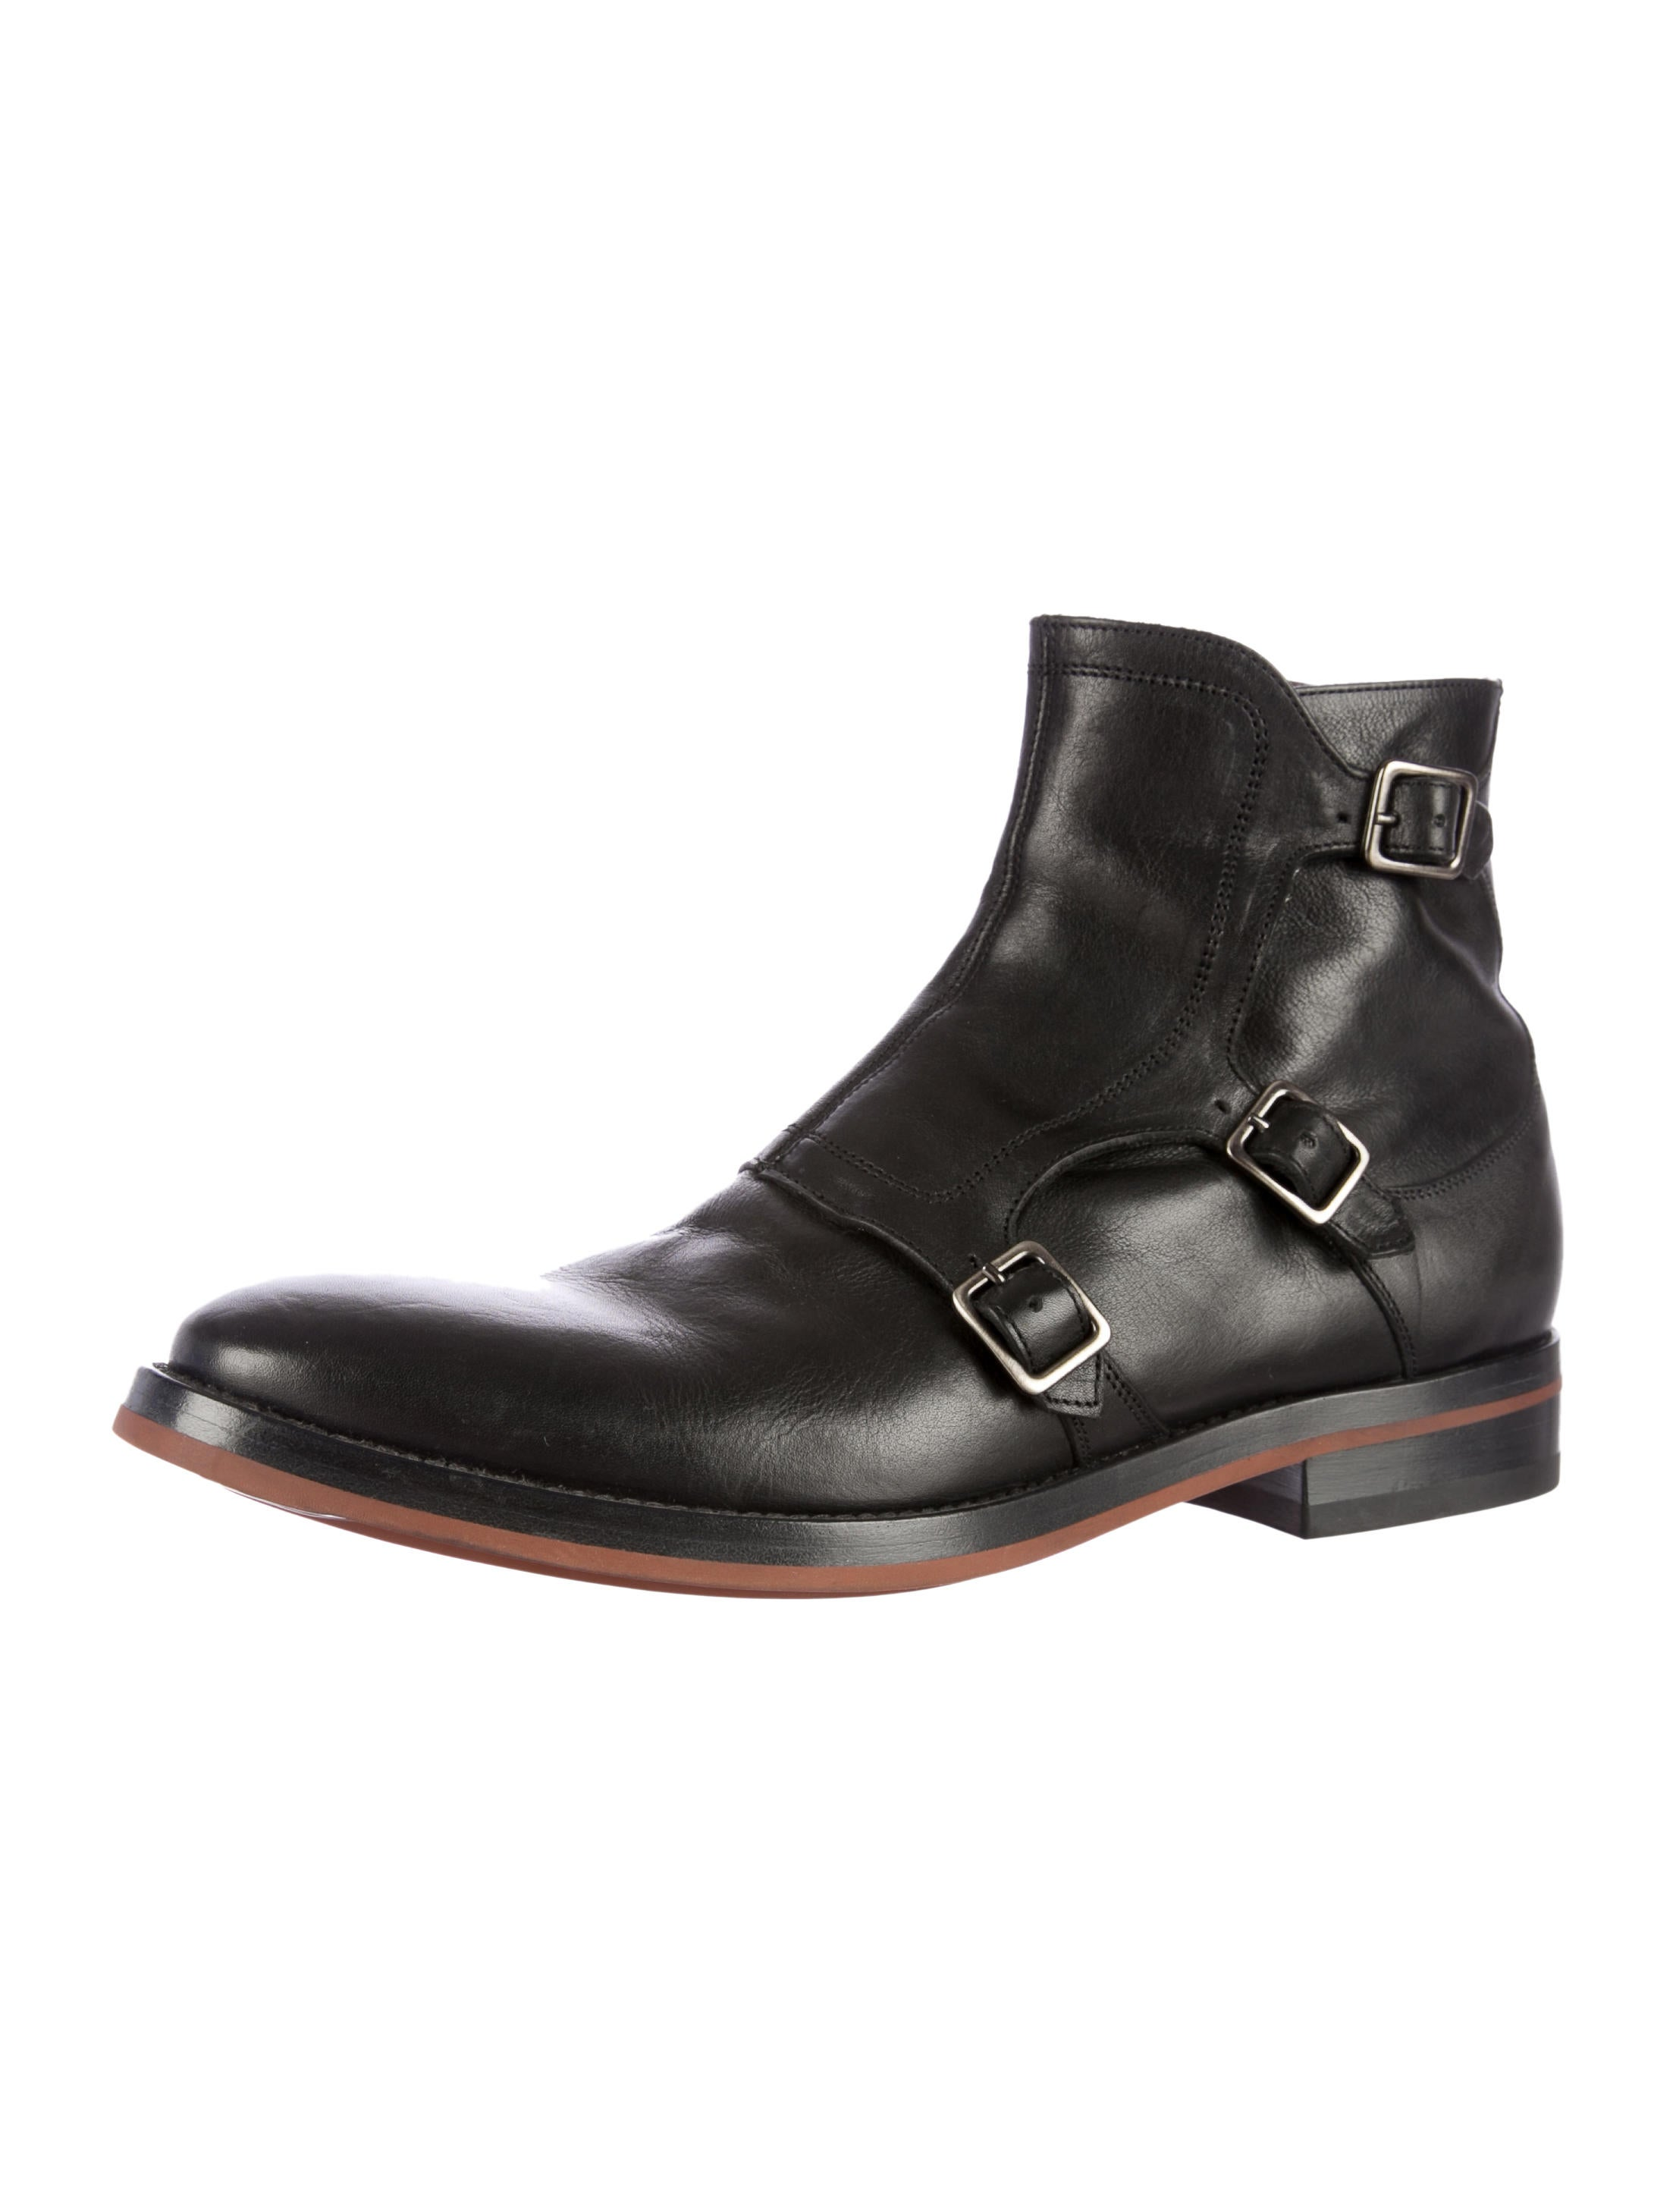 mcqueen monk chelsea boots shoes